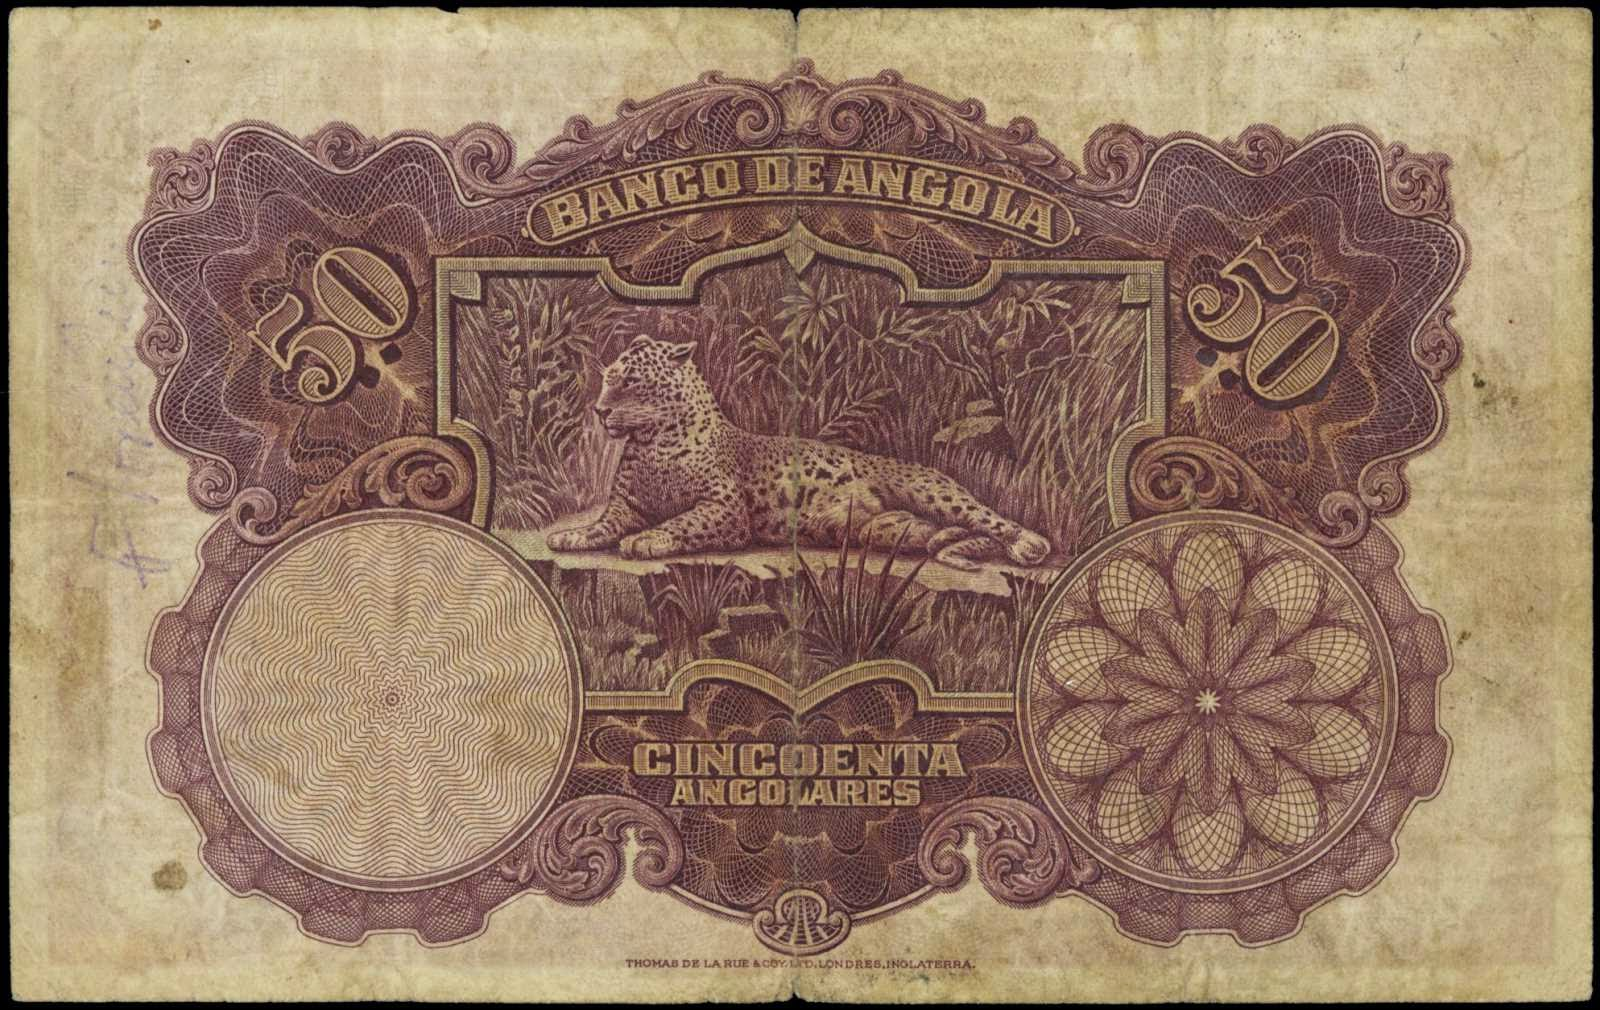 Angola 50 Angolares banknote 1927 Leopard